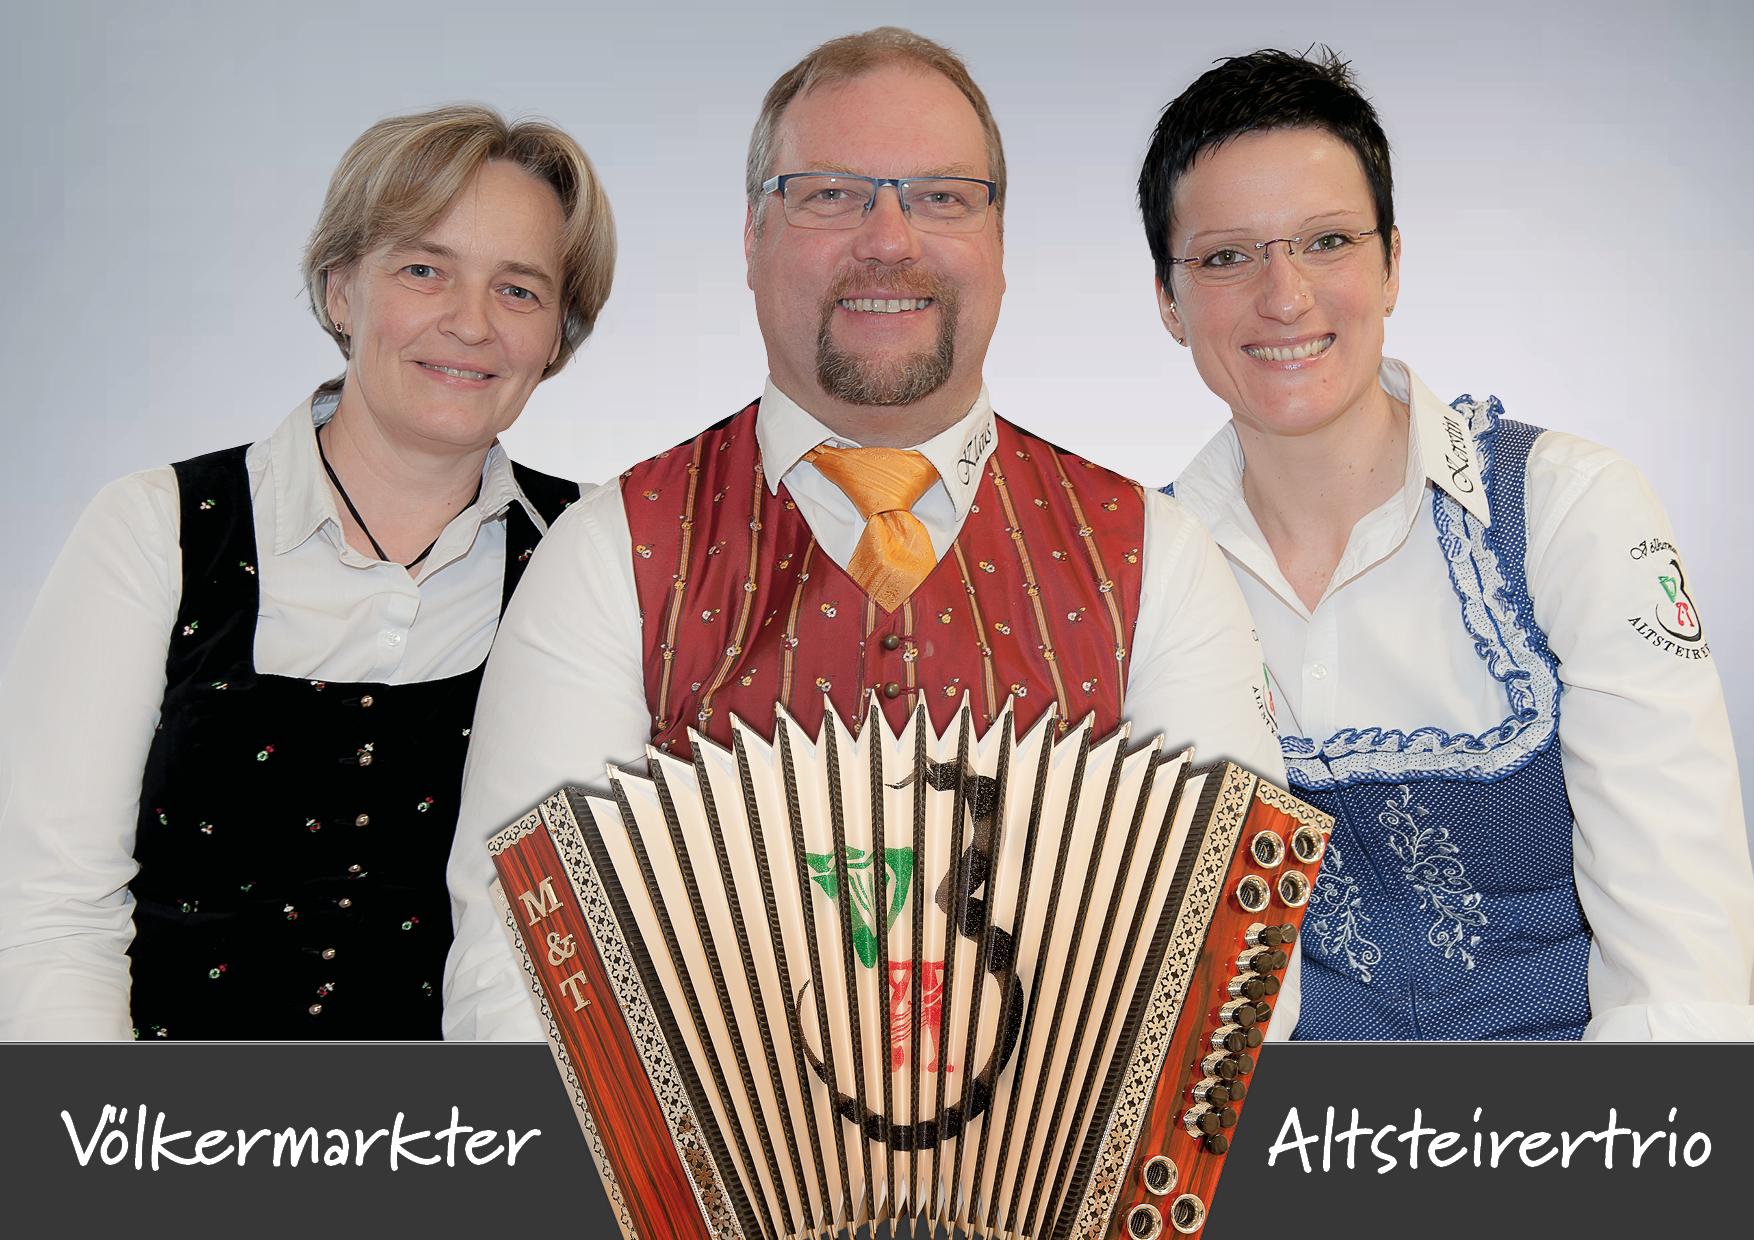 Völkermarkter Altsteirertrio